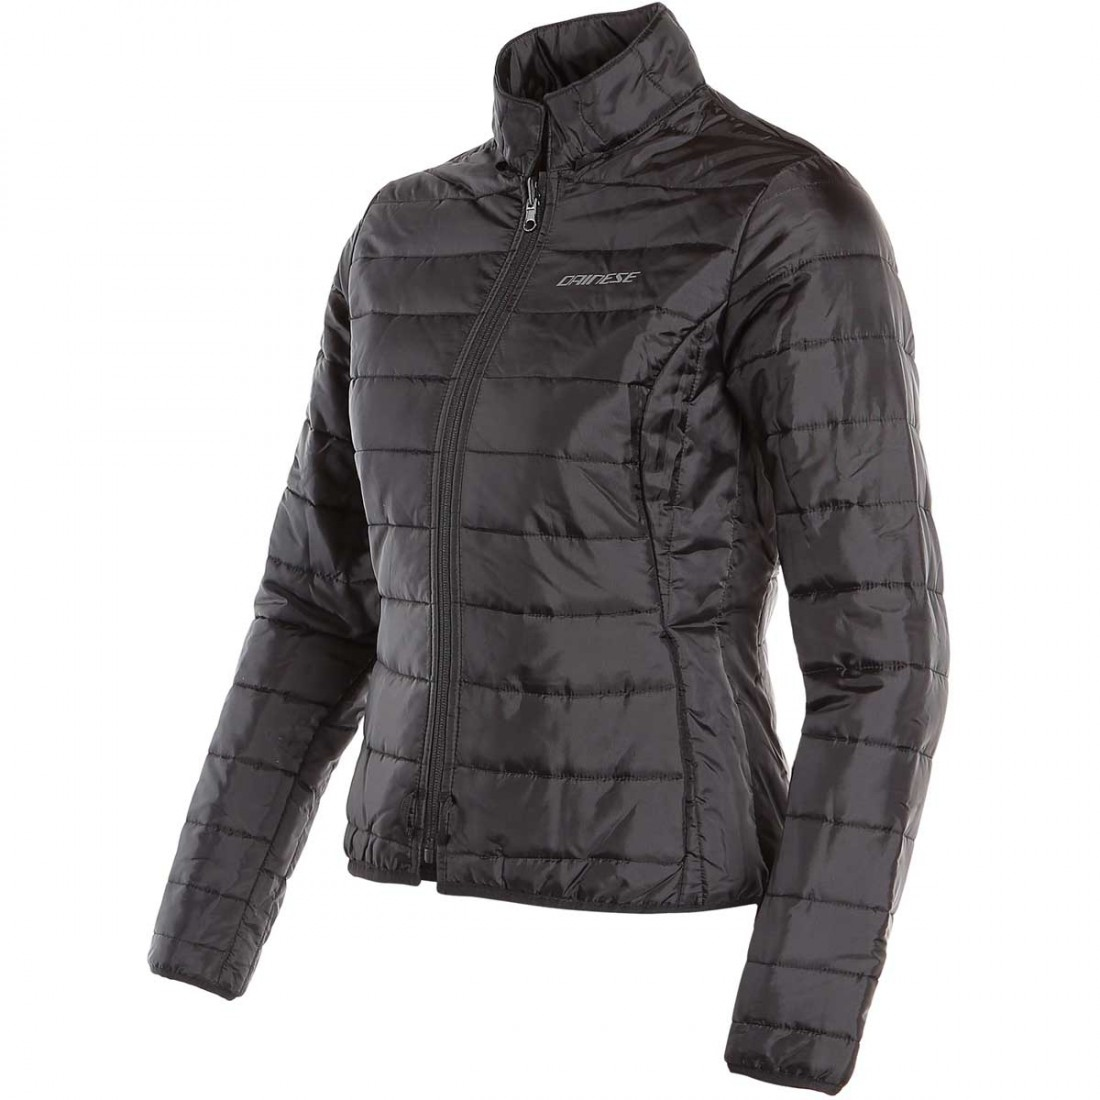 1fa01c6ea9472 DAINESE Tempest 2 D-Dry Lady Black / Ebony Jacket · Motocard